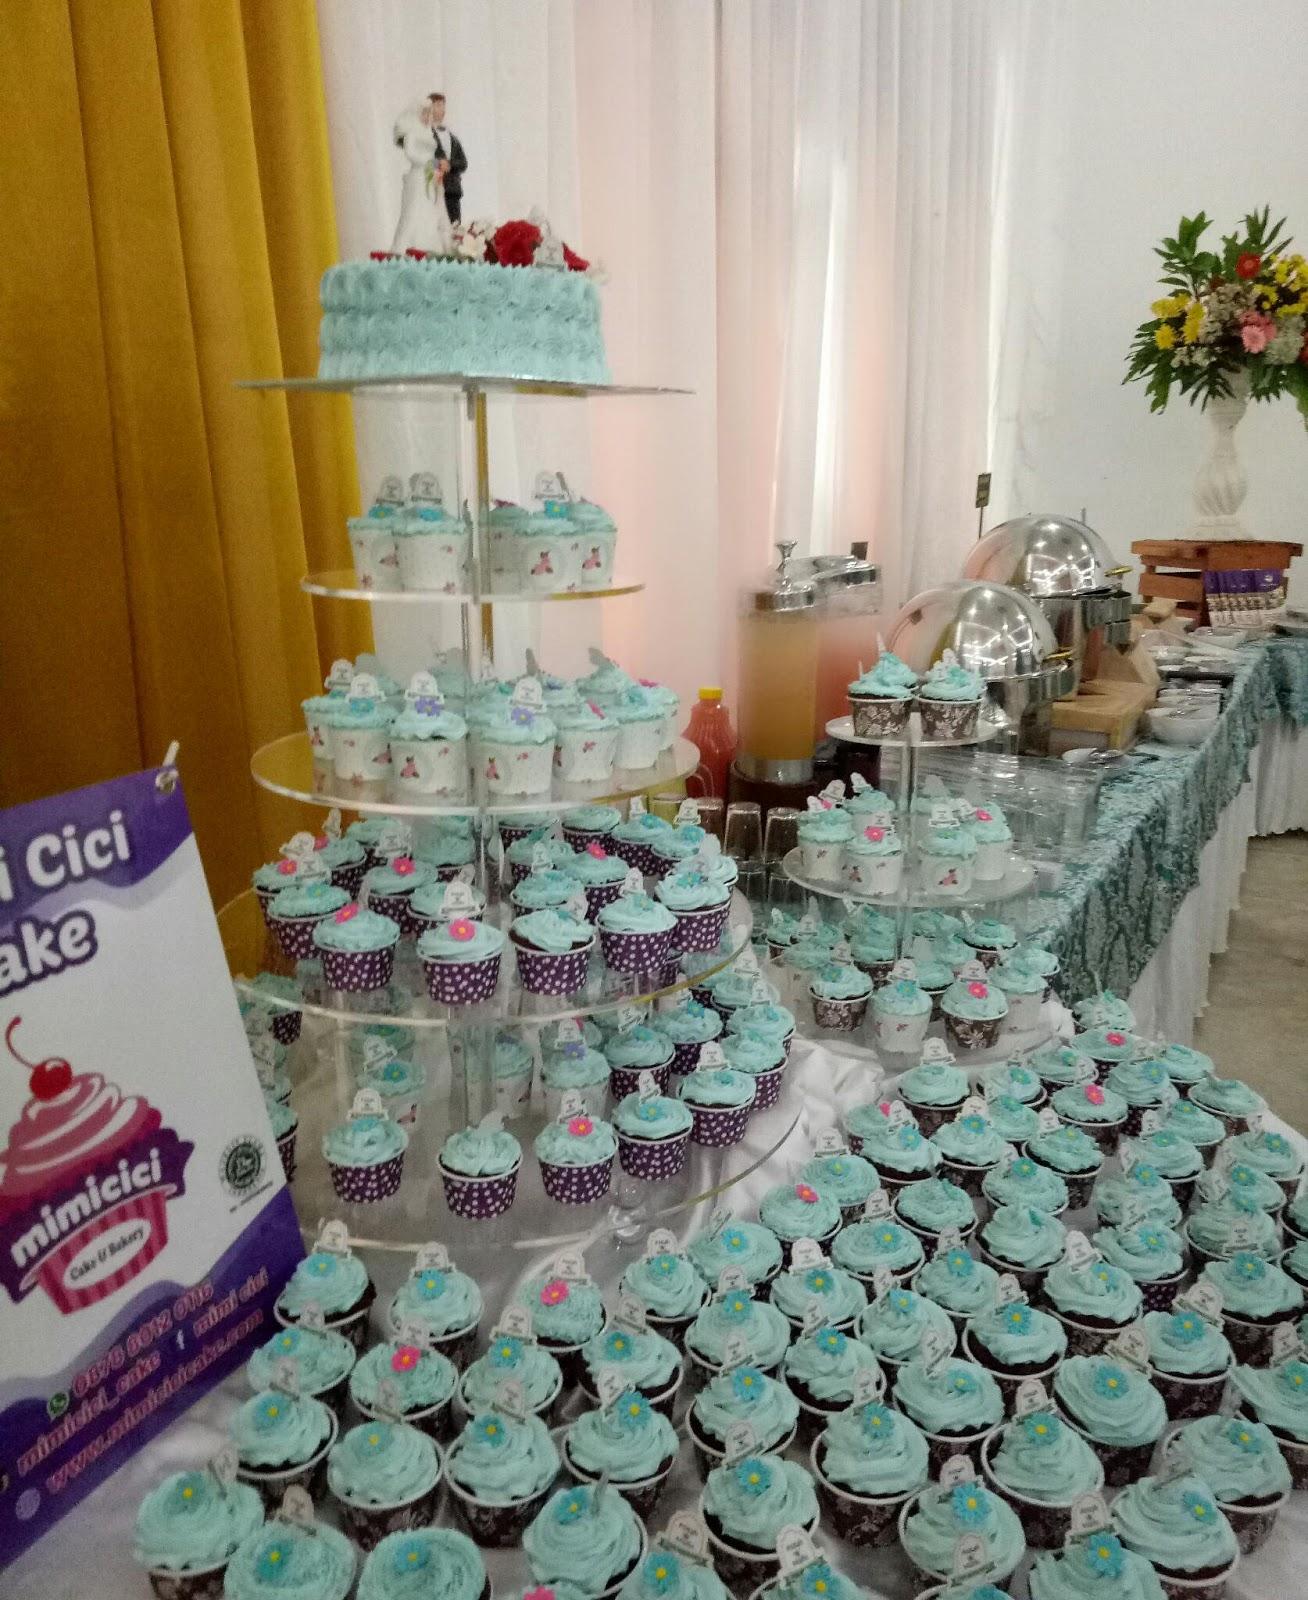 mimi cici cake Wedding cake toko kue mimicicicake bojonggede bogor